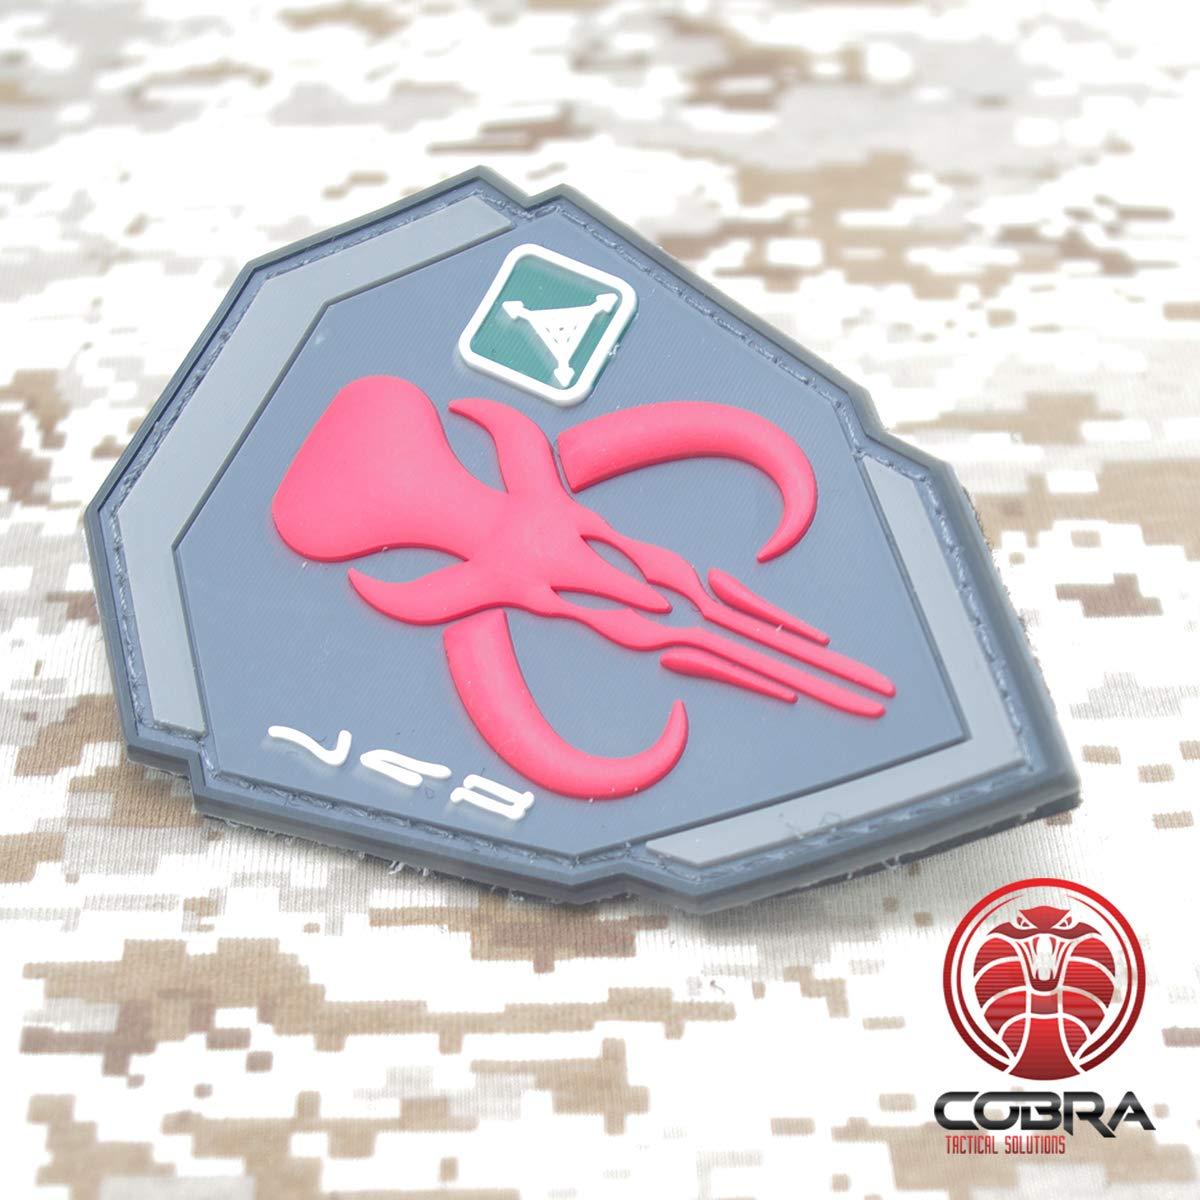 Cobra Tactical Solutions Military PVC Patch Cazarecompenzas Boba Fett Mandalorian Bantha cr/áneo Rojo con Velcro para Airsoft para Ropa//Mochila T/áctica Paintball